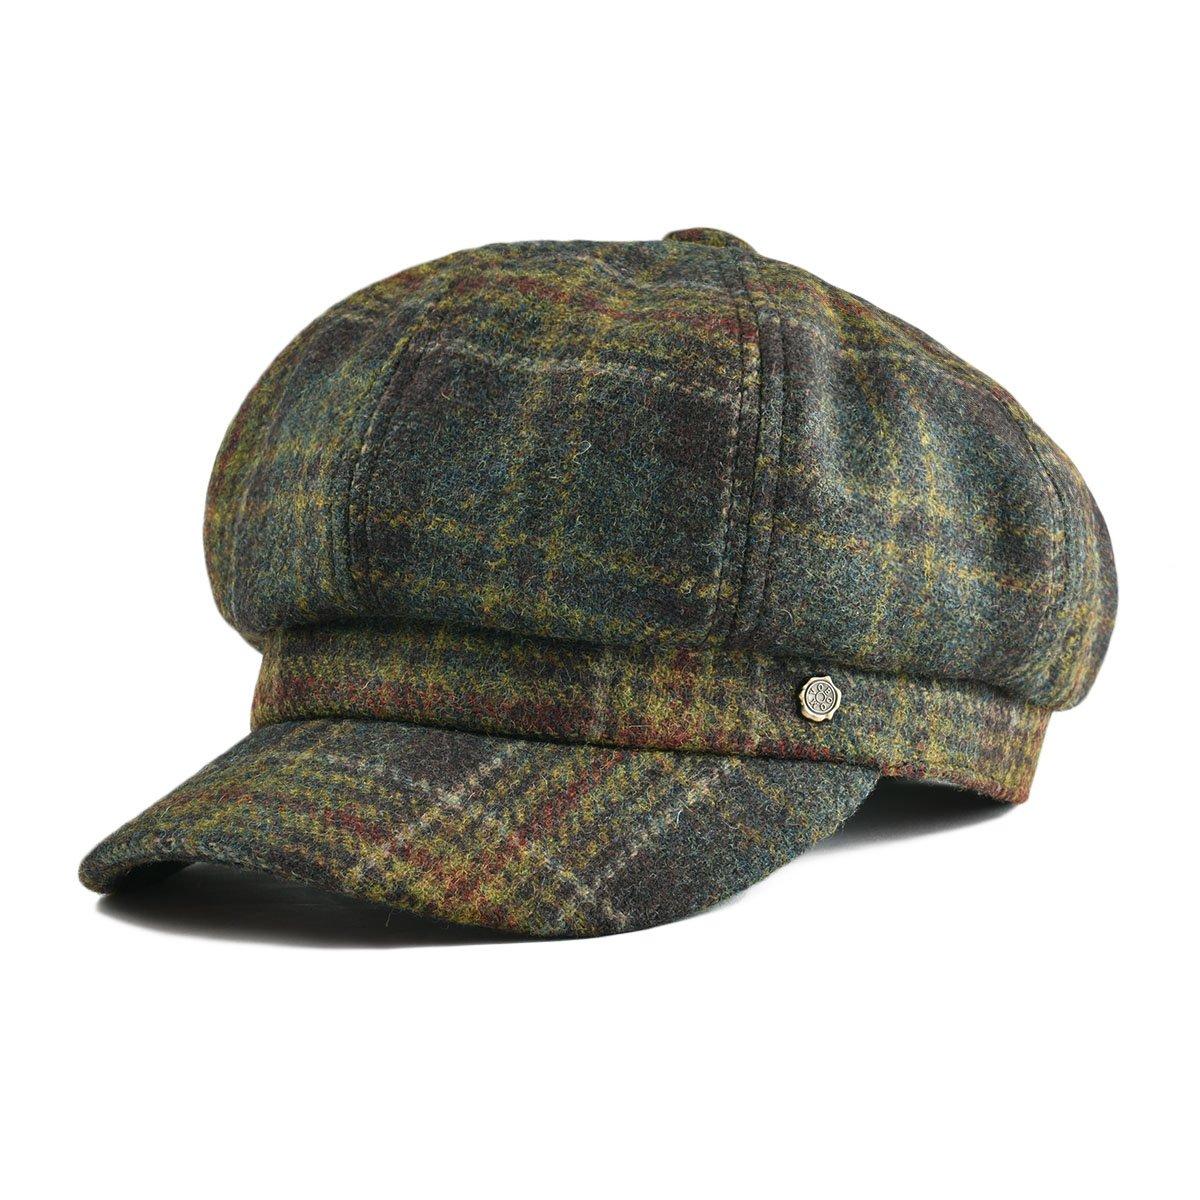 VOBOOM Womens Visor Beret Newsboy Hat Cap for Ladies 100% Wool Tweed (Green)